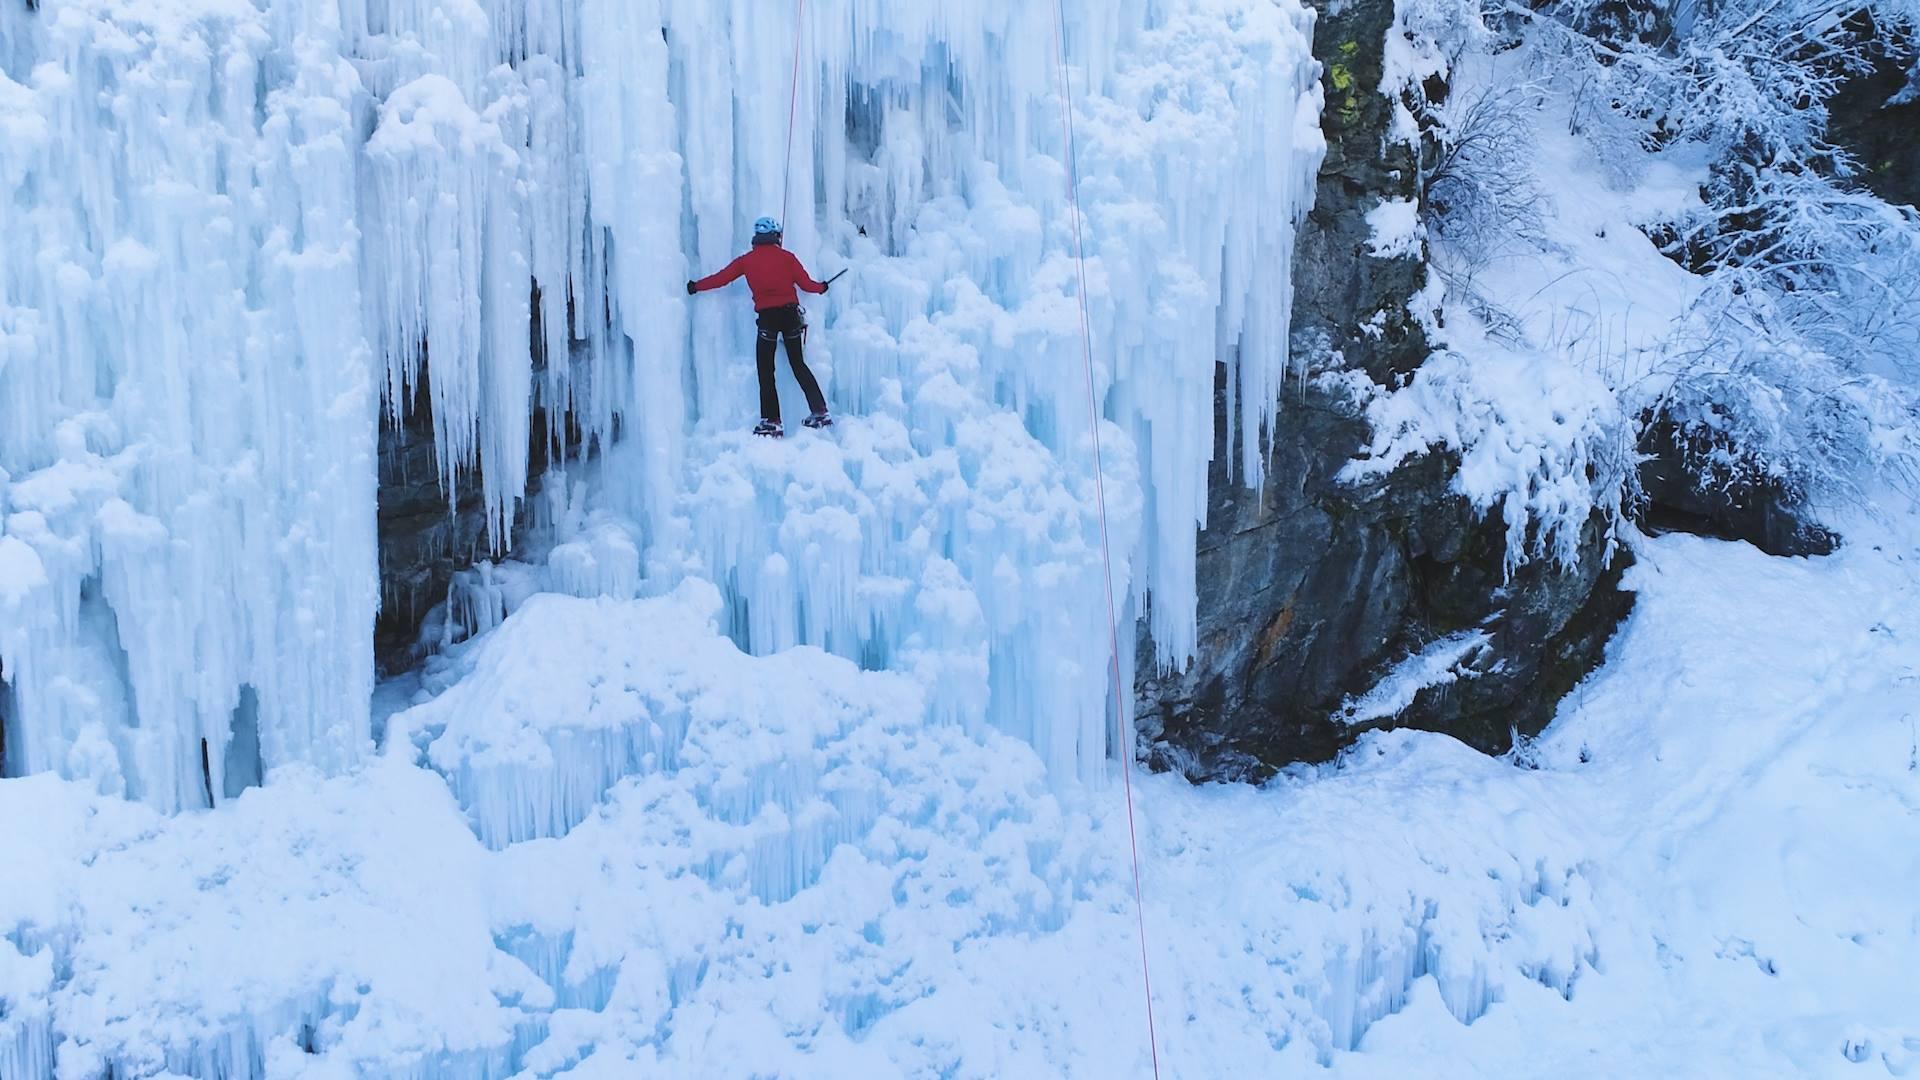 Drone | Cascade de glace